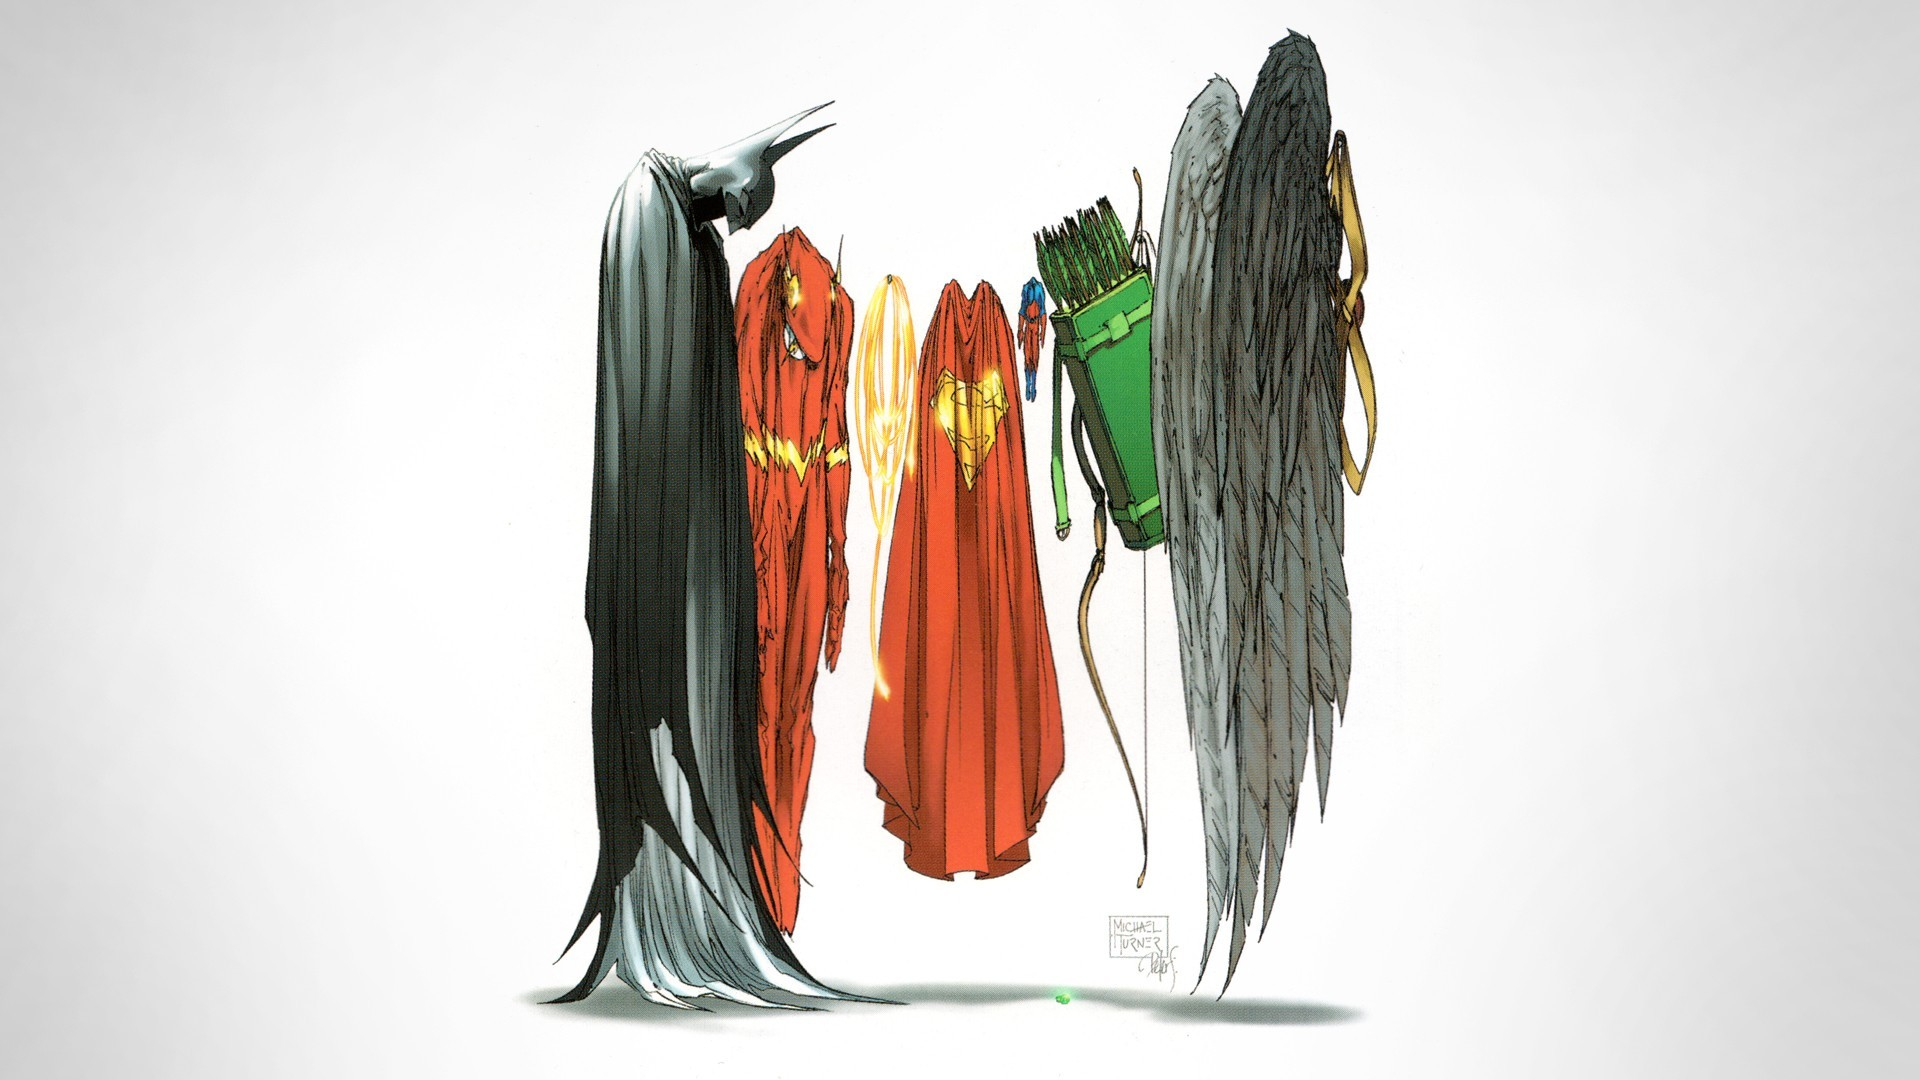 General 1920x1080 superhero cape Batman costumes Superman The Flash Green Arrow Wonder Woman simple background Michael Turner illustration The Atom Hawkman Justice League